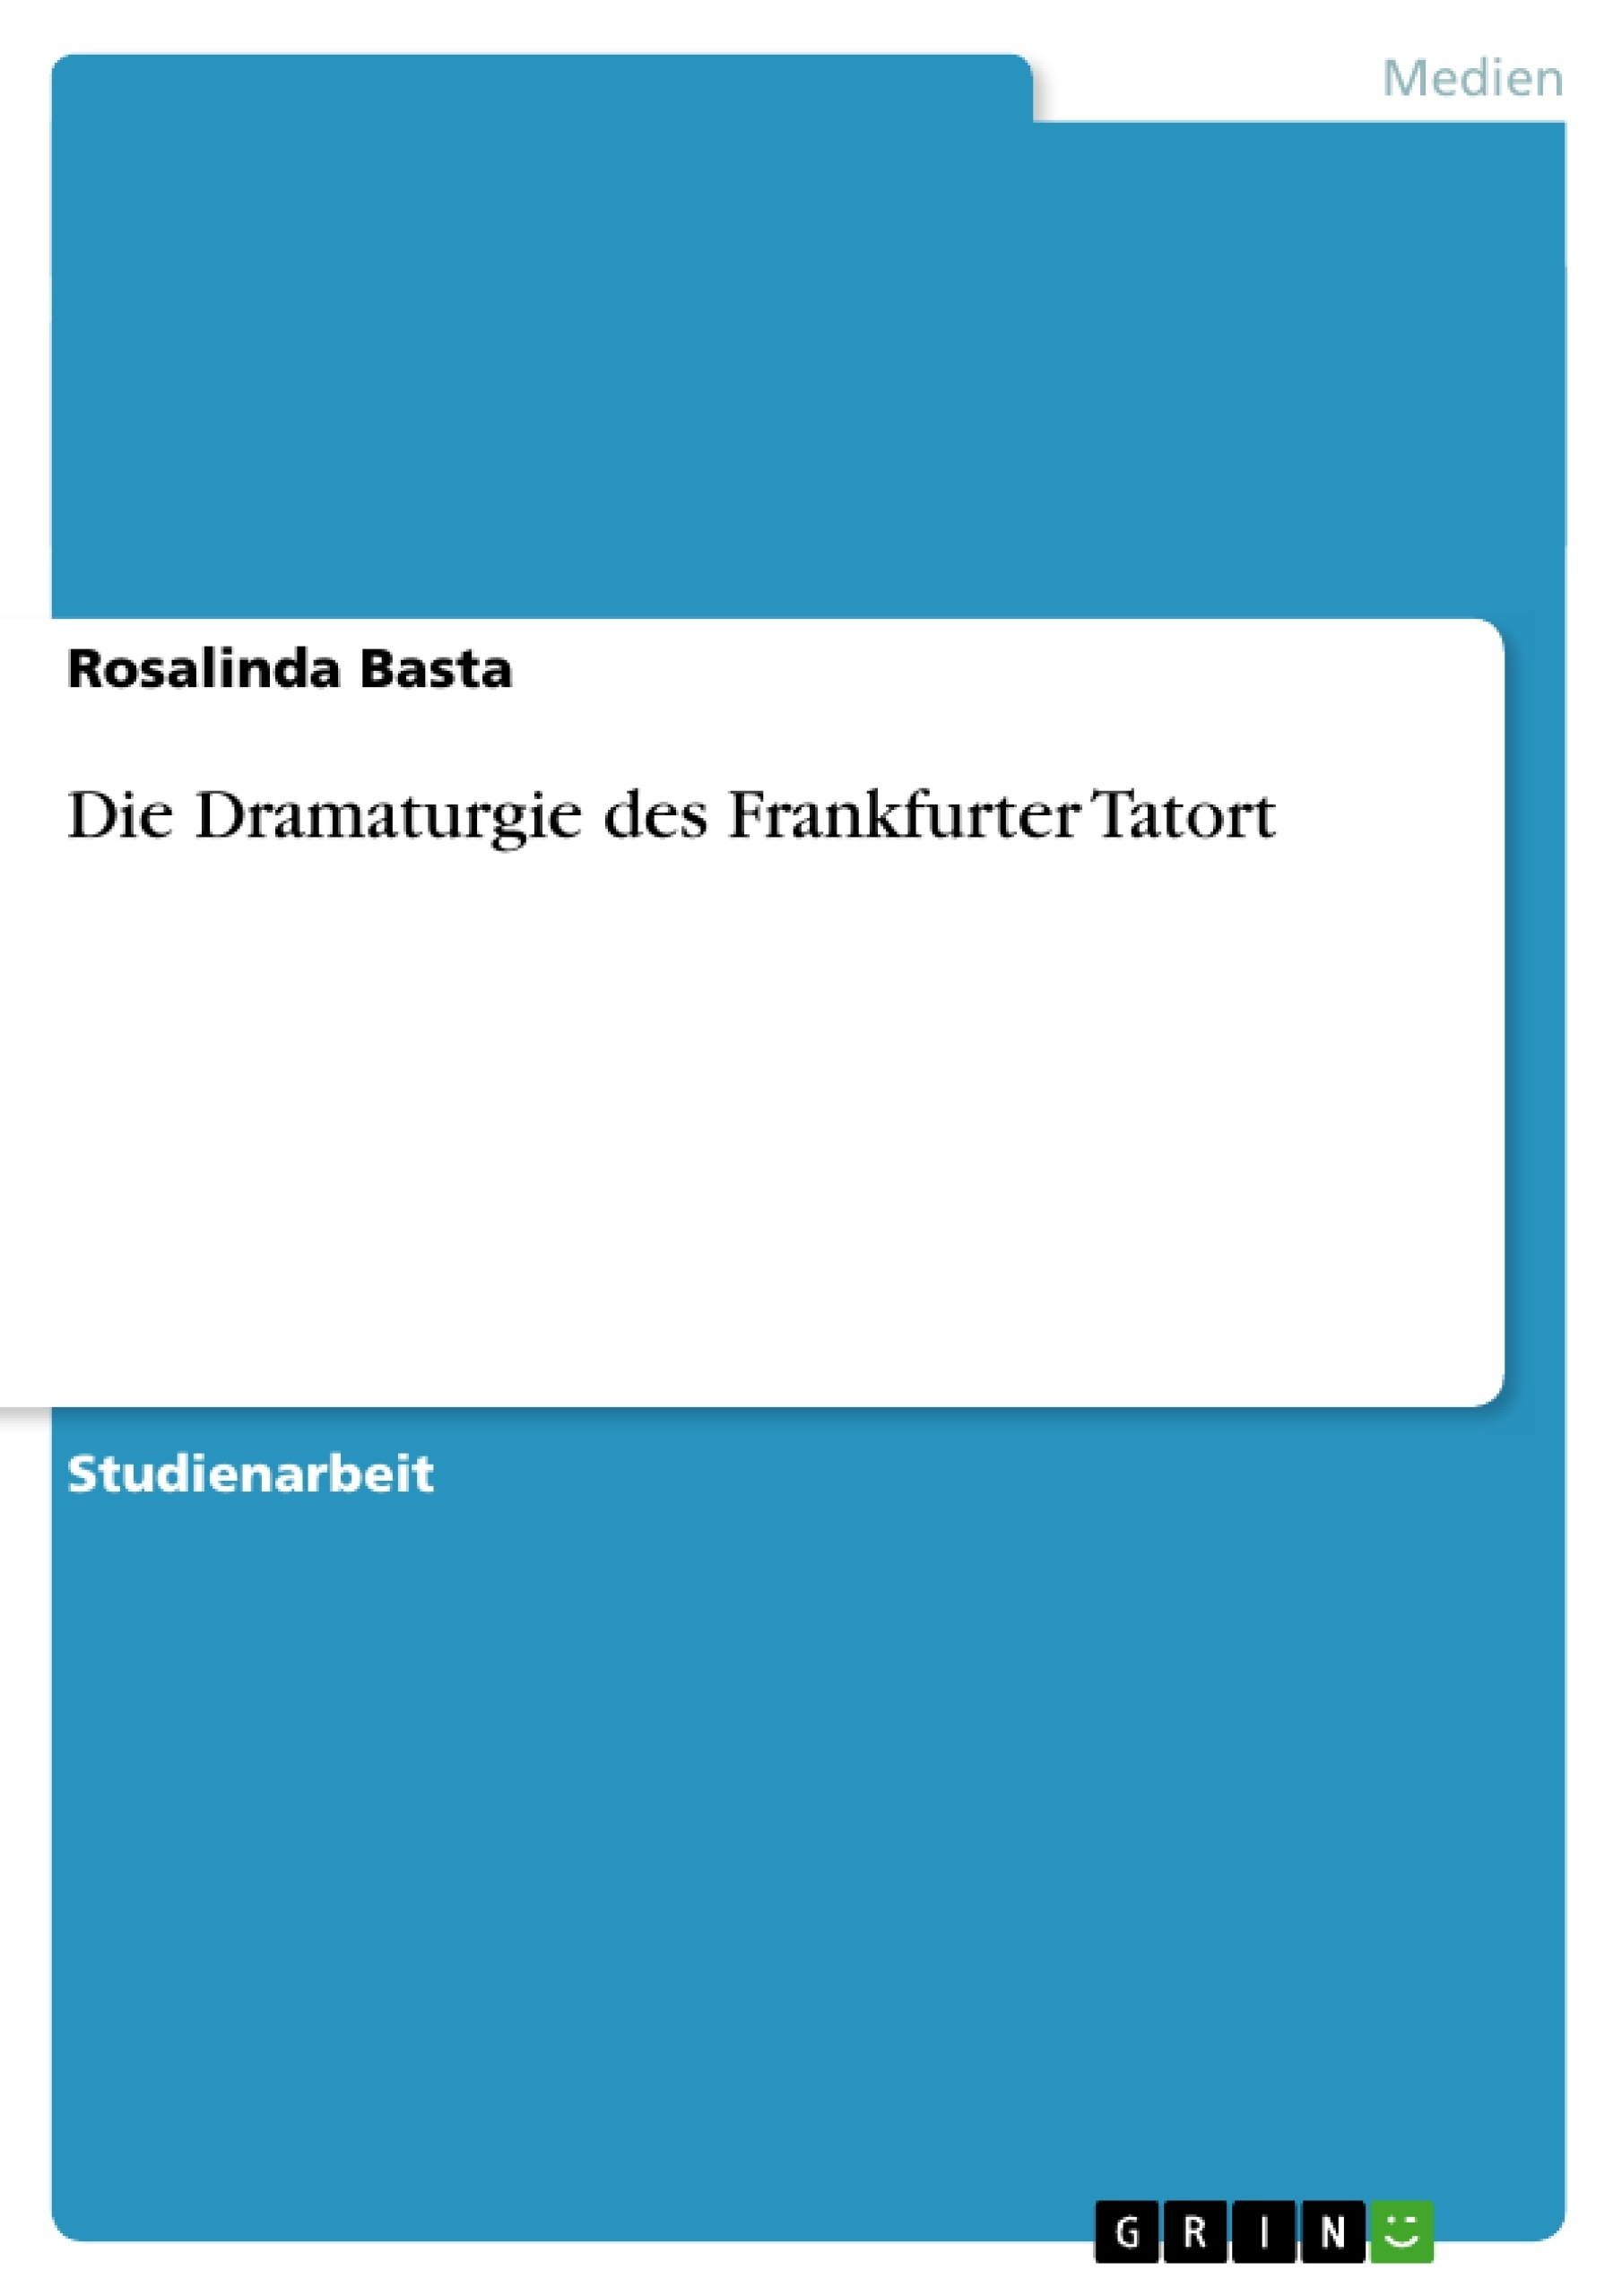 Titel: Die Dramaturgie des Frankfurter Tatort